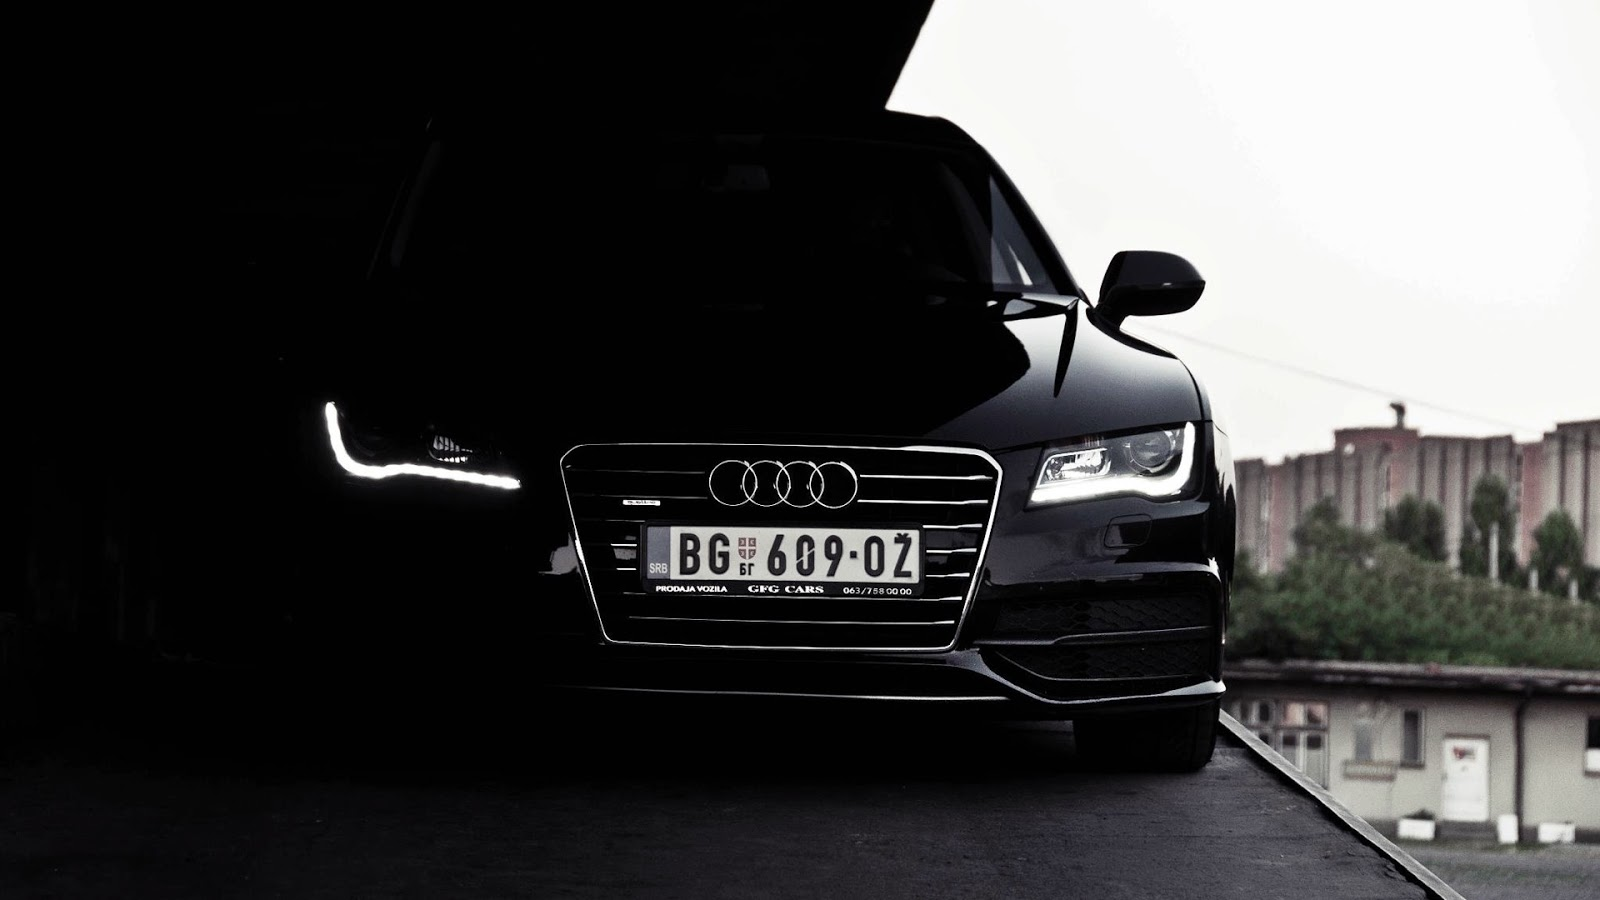 Best Bmw Car Wallpapers Black Audi A7 In Dark Headlights Hd Wallpaper Hd Car